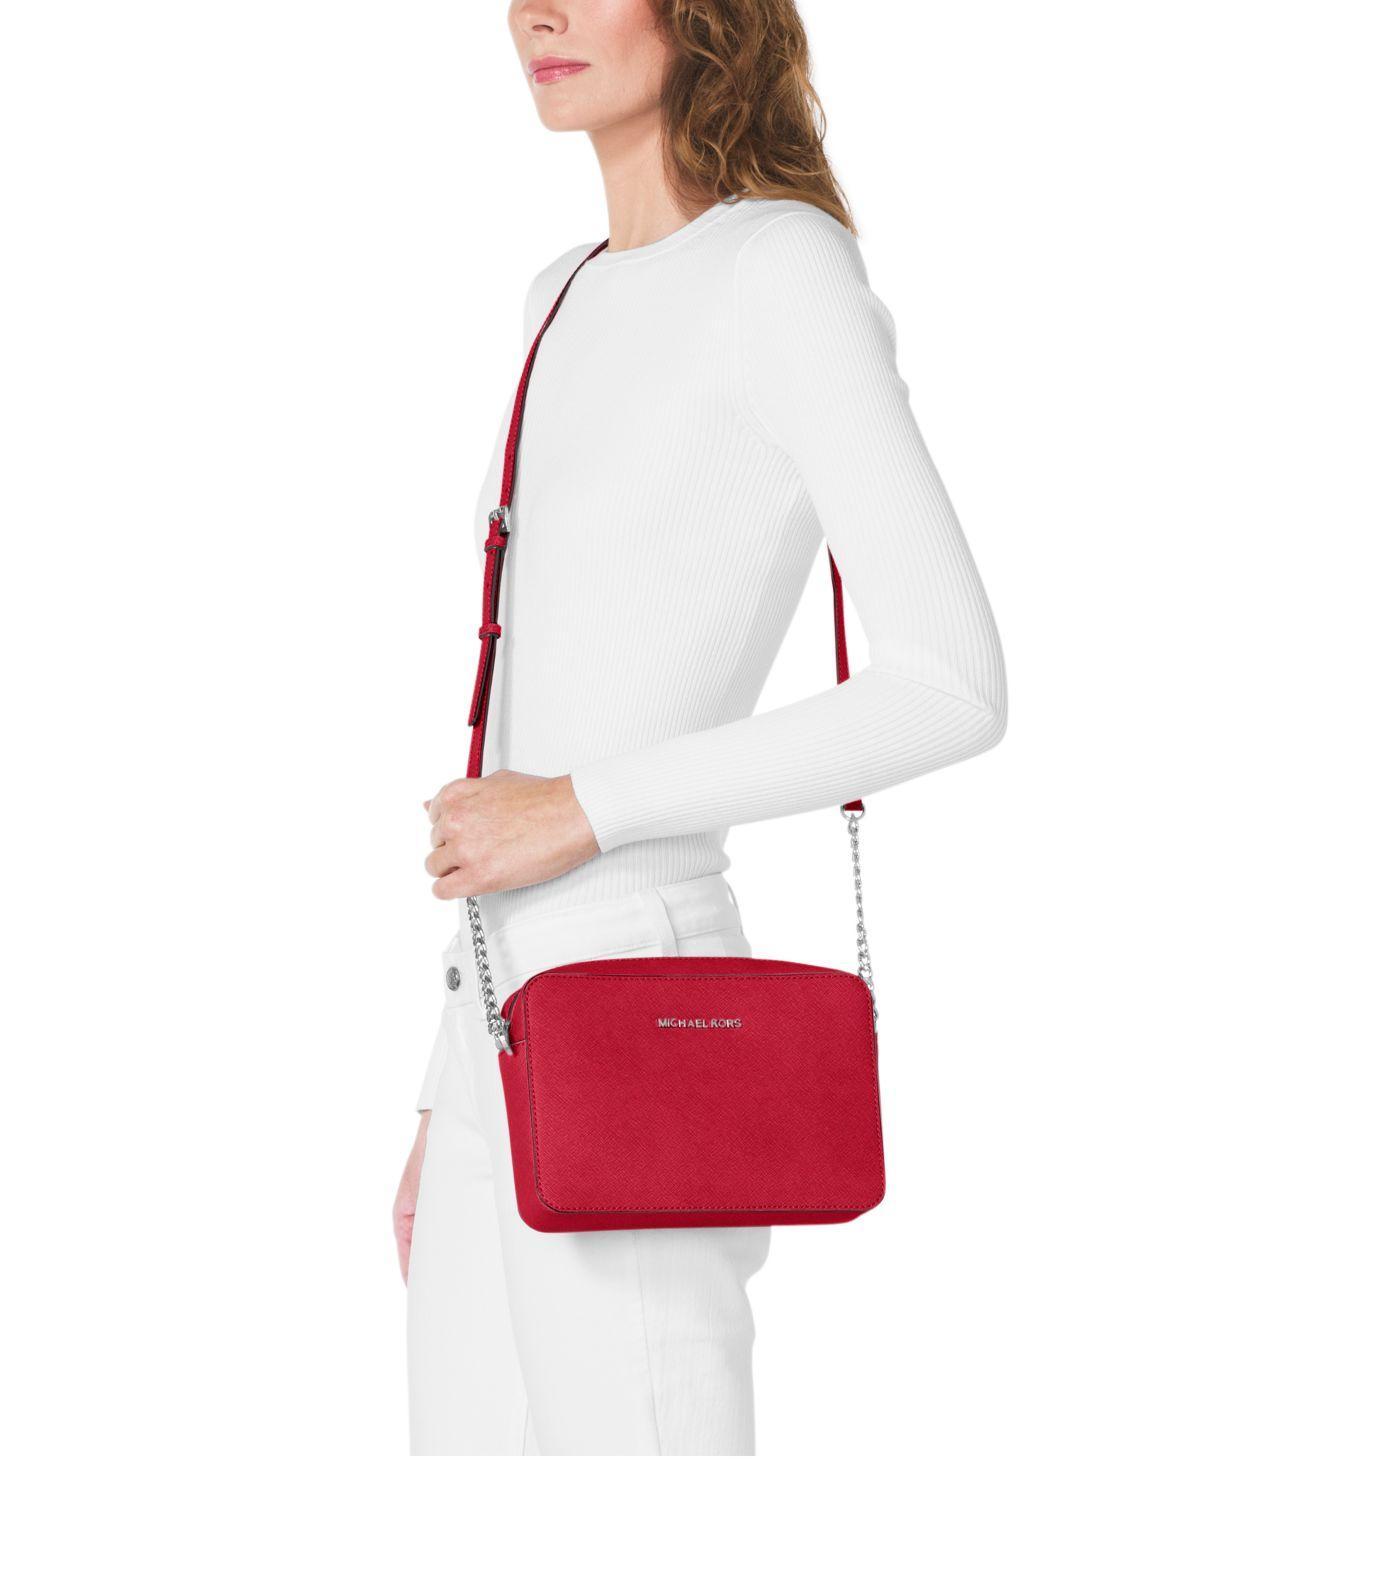 Jet Set Large Saffiano Leather Crossbody Bag